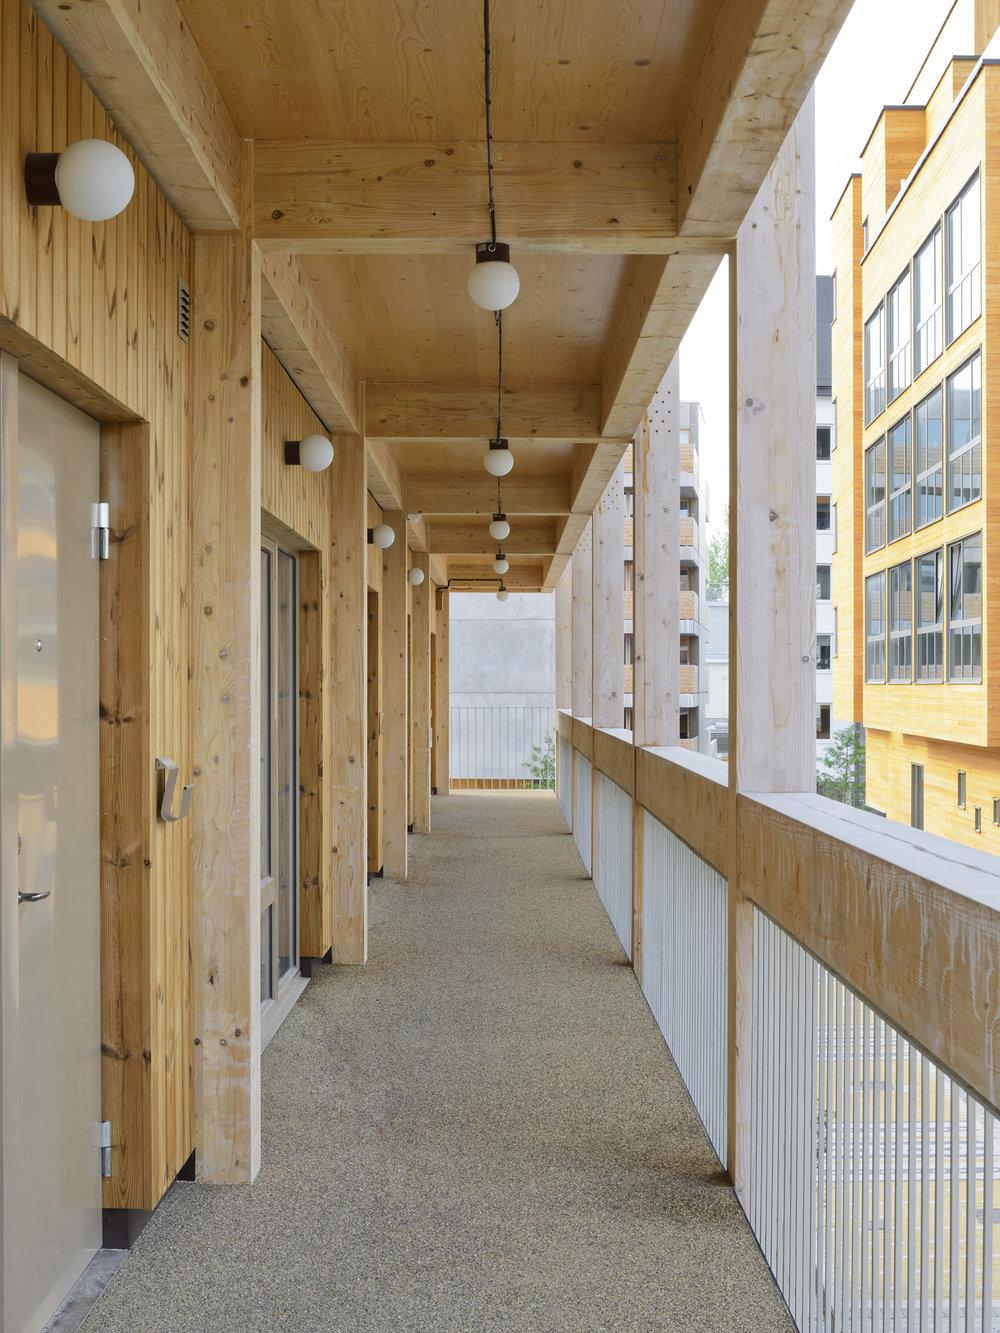 Traloftet-SPRIDD-©MikaelOlsson4178b-2.jpg